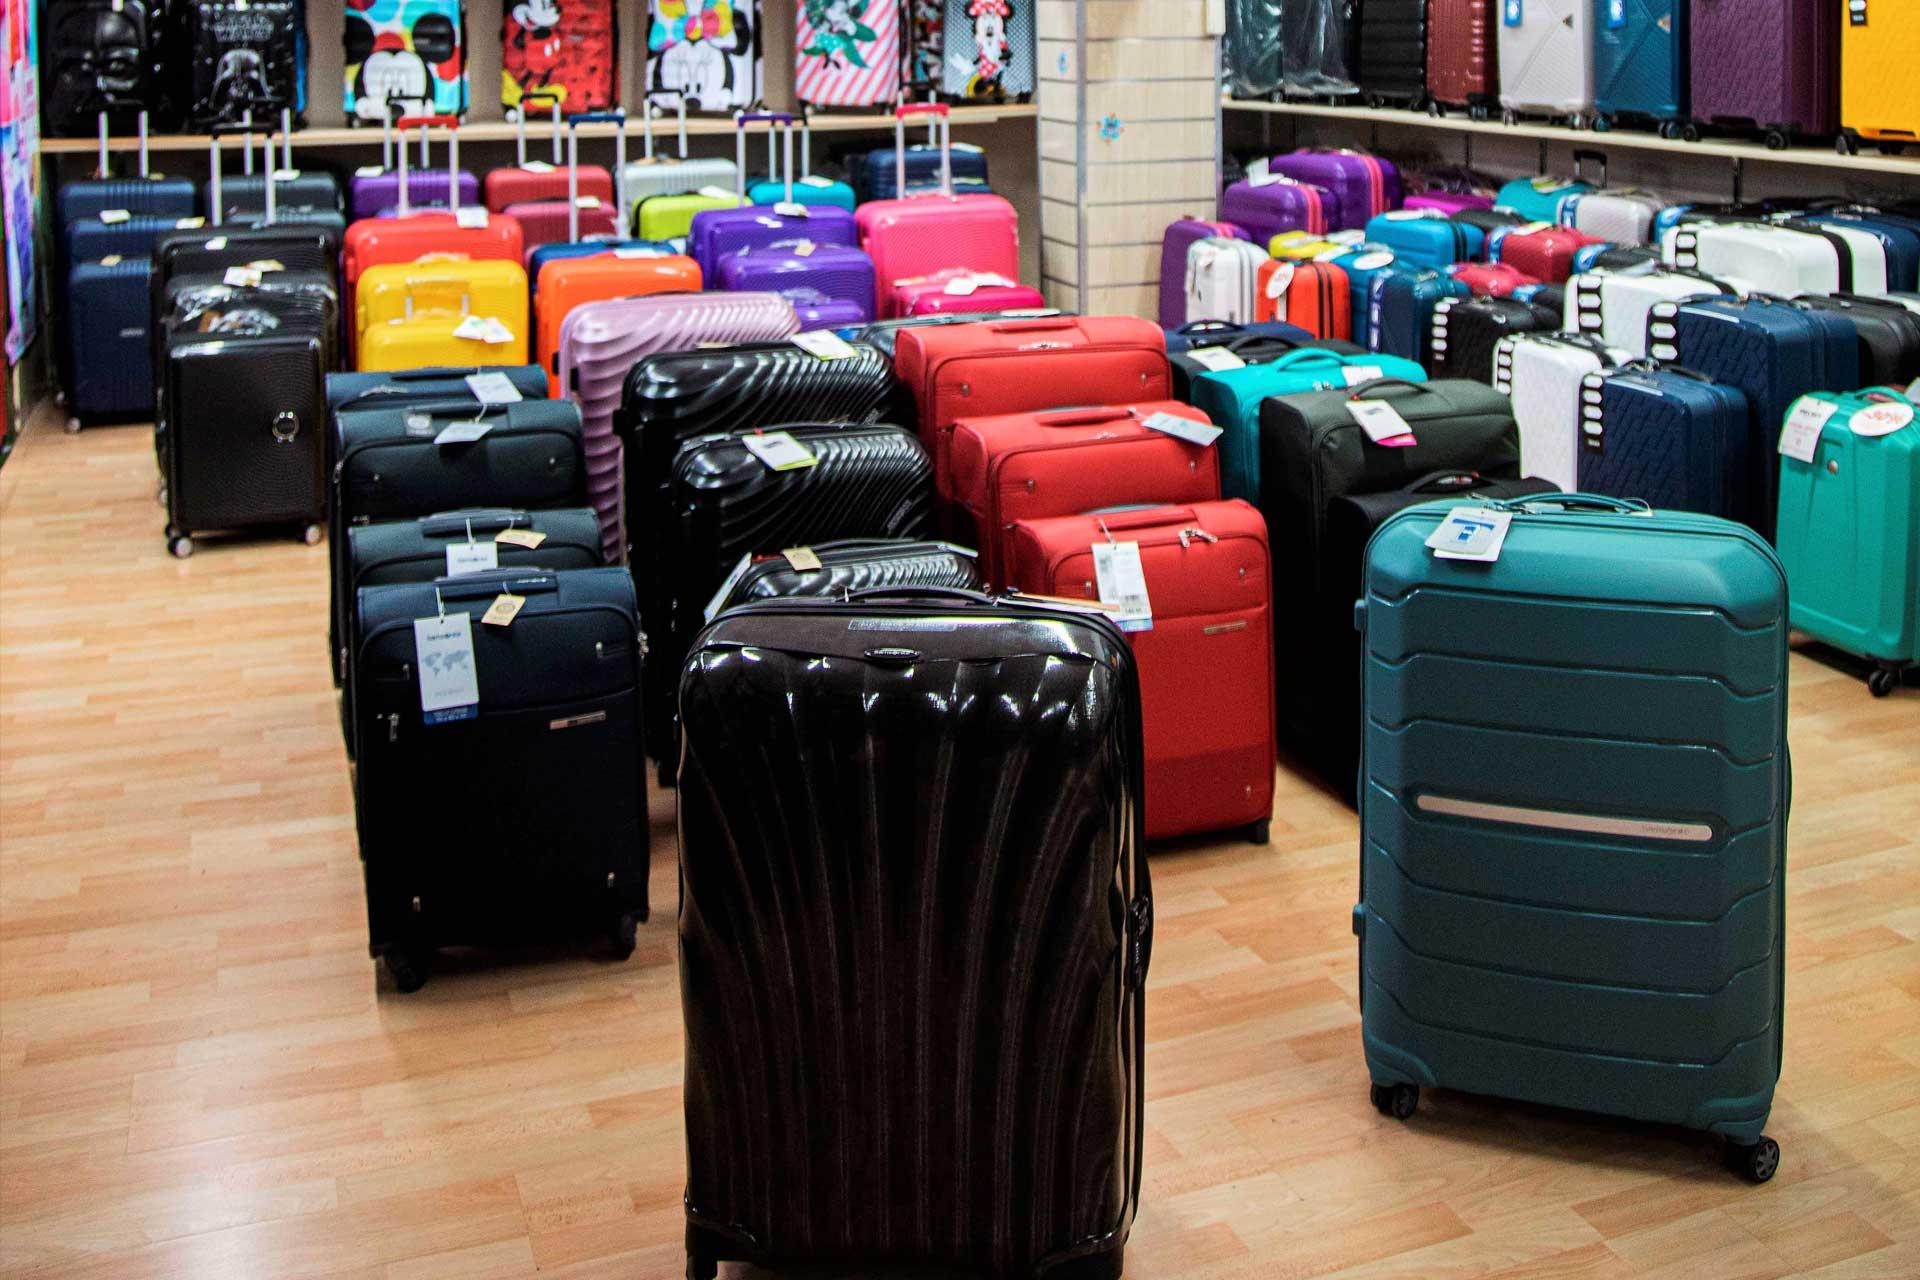 Verobags - Βαλίτσες